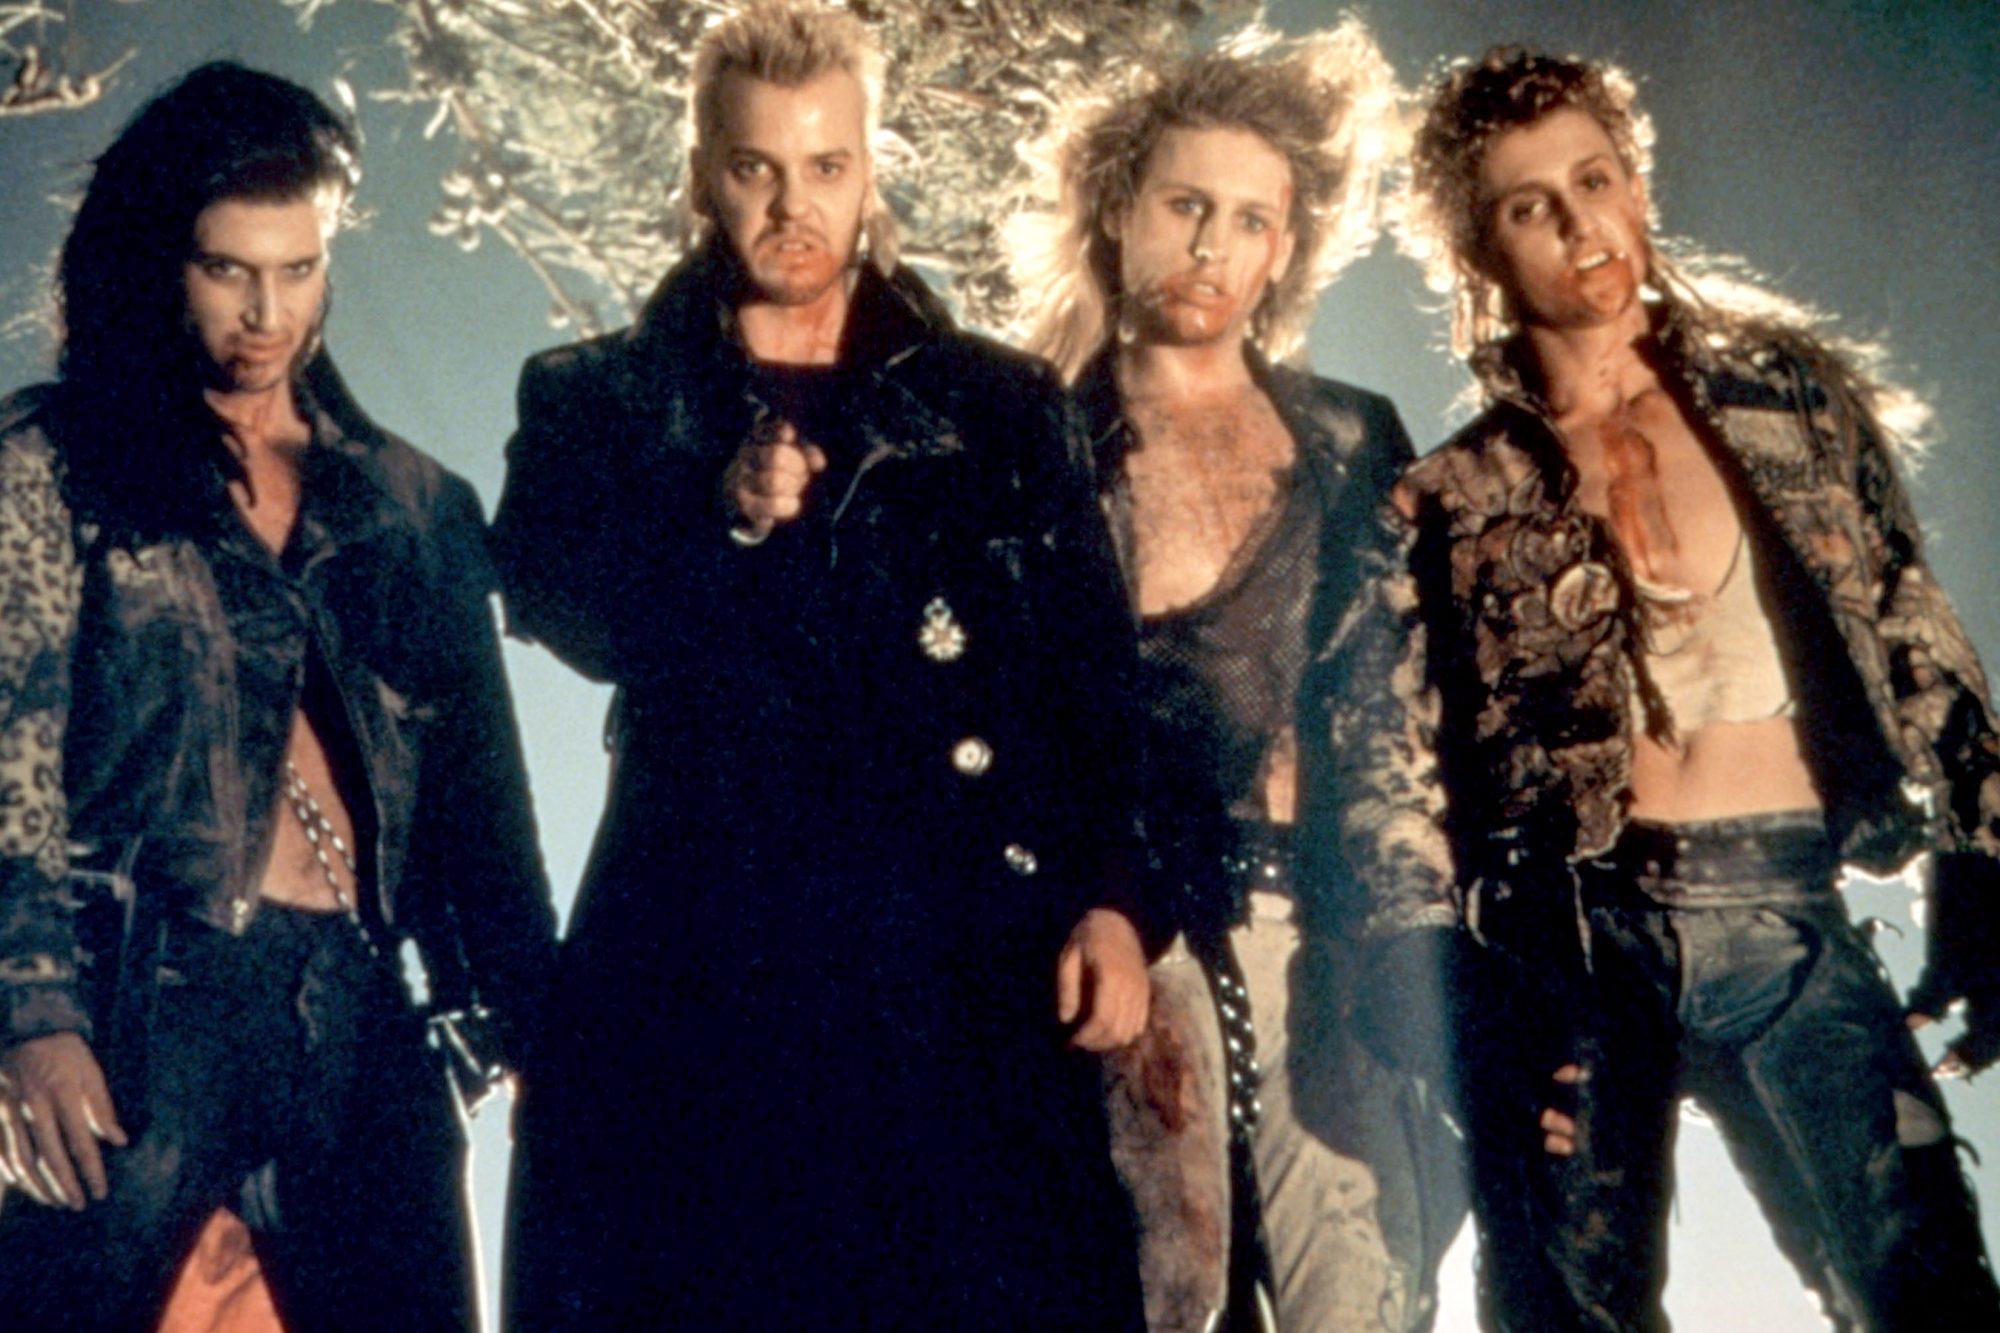 THE LOST BOYS, Billy Wirth, Kiefer Sutherland, Brooke McCarter, Alex Winter, 1987. ©Warner Bros./cou